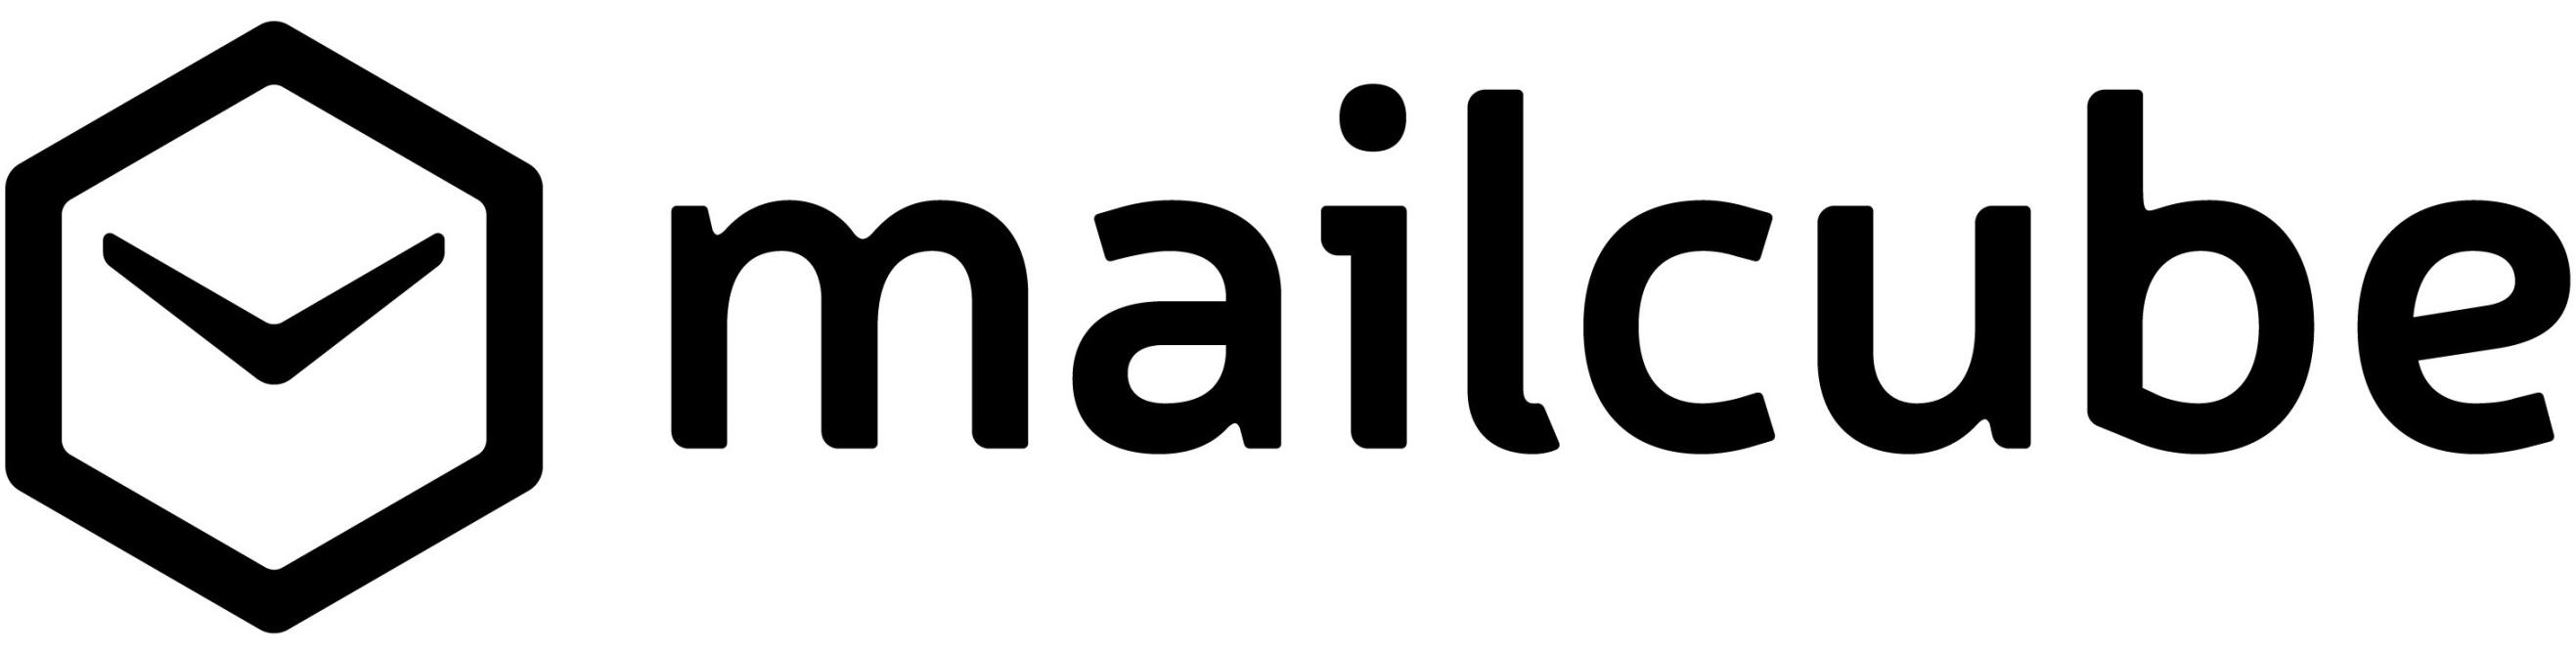 mailcube-logo